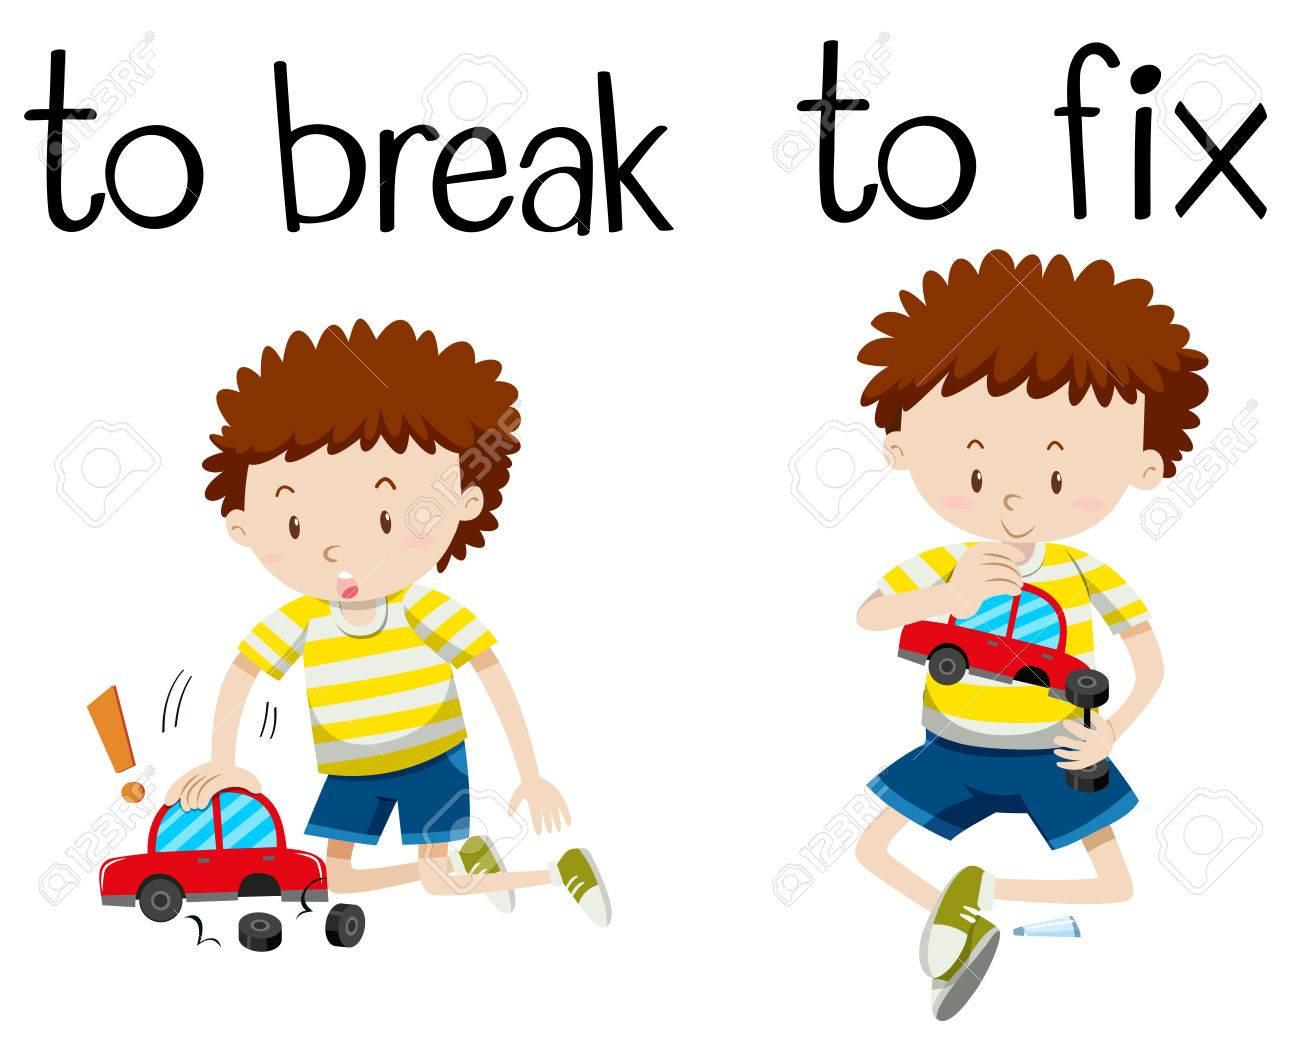 Opposite wordcard for break and fix illustration.